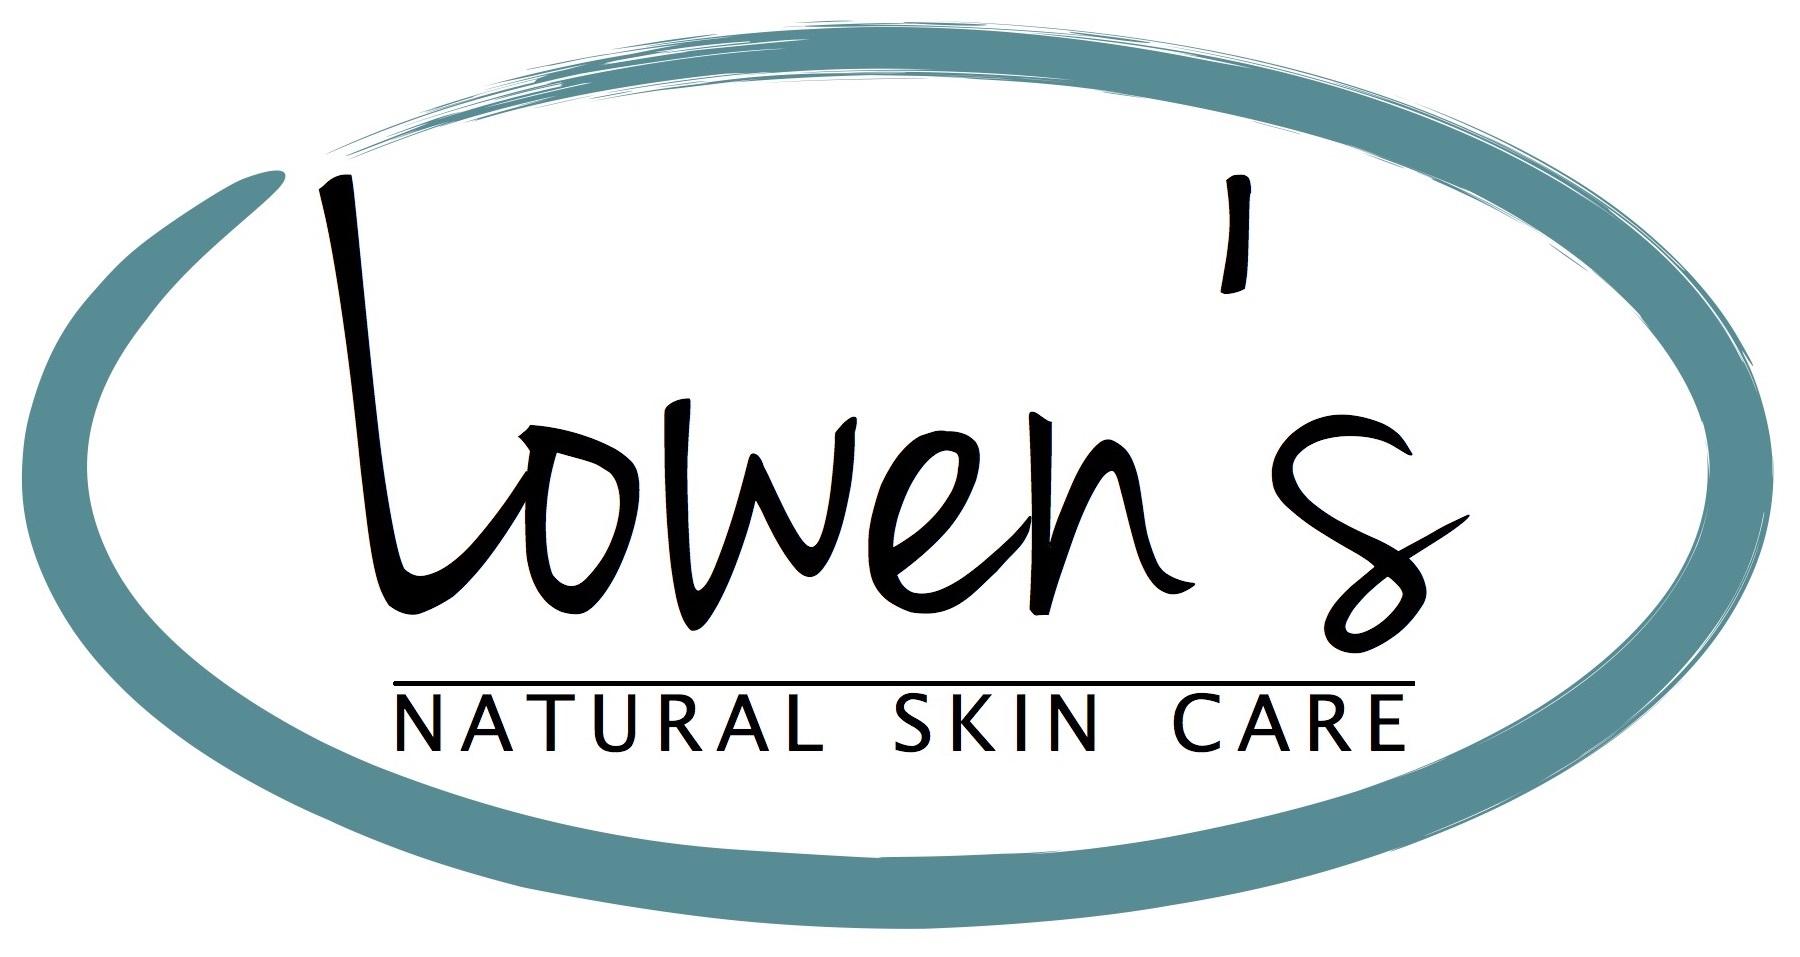 Lowen's Natural Skin Care